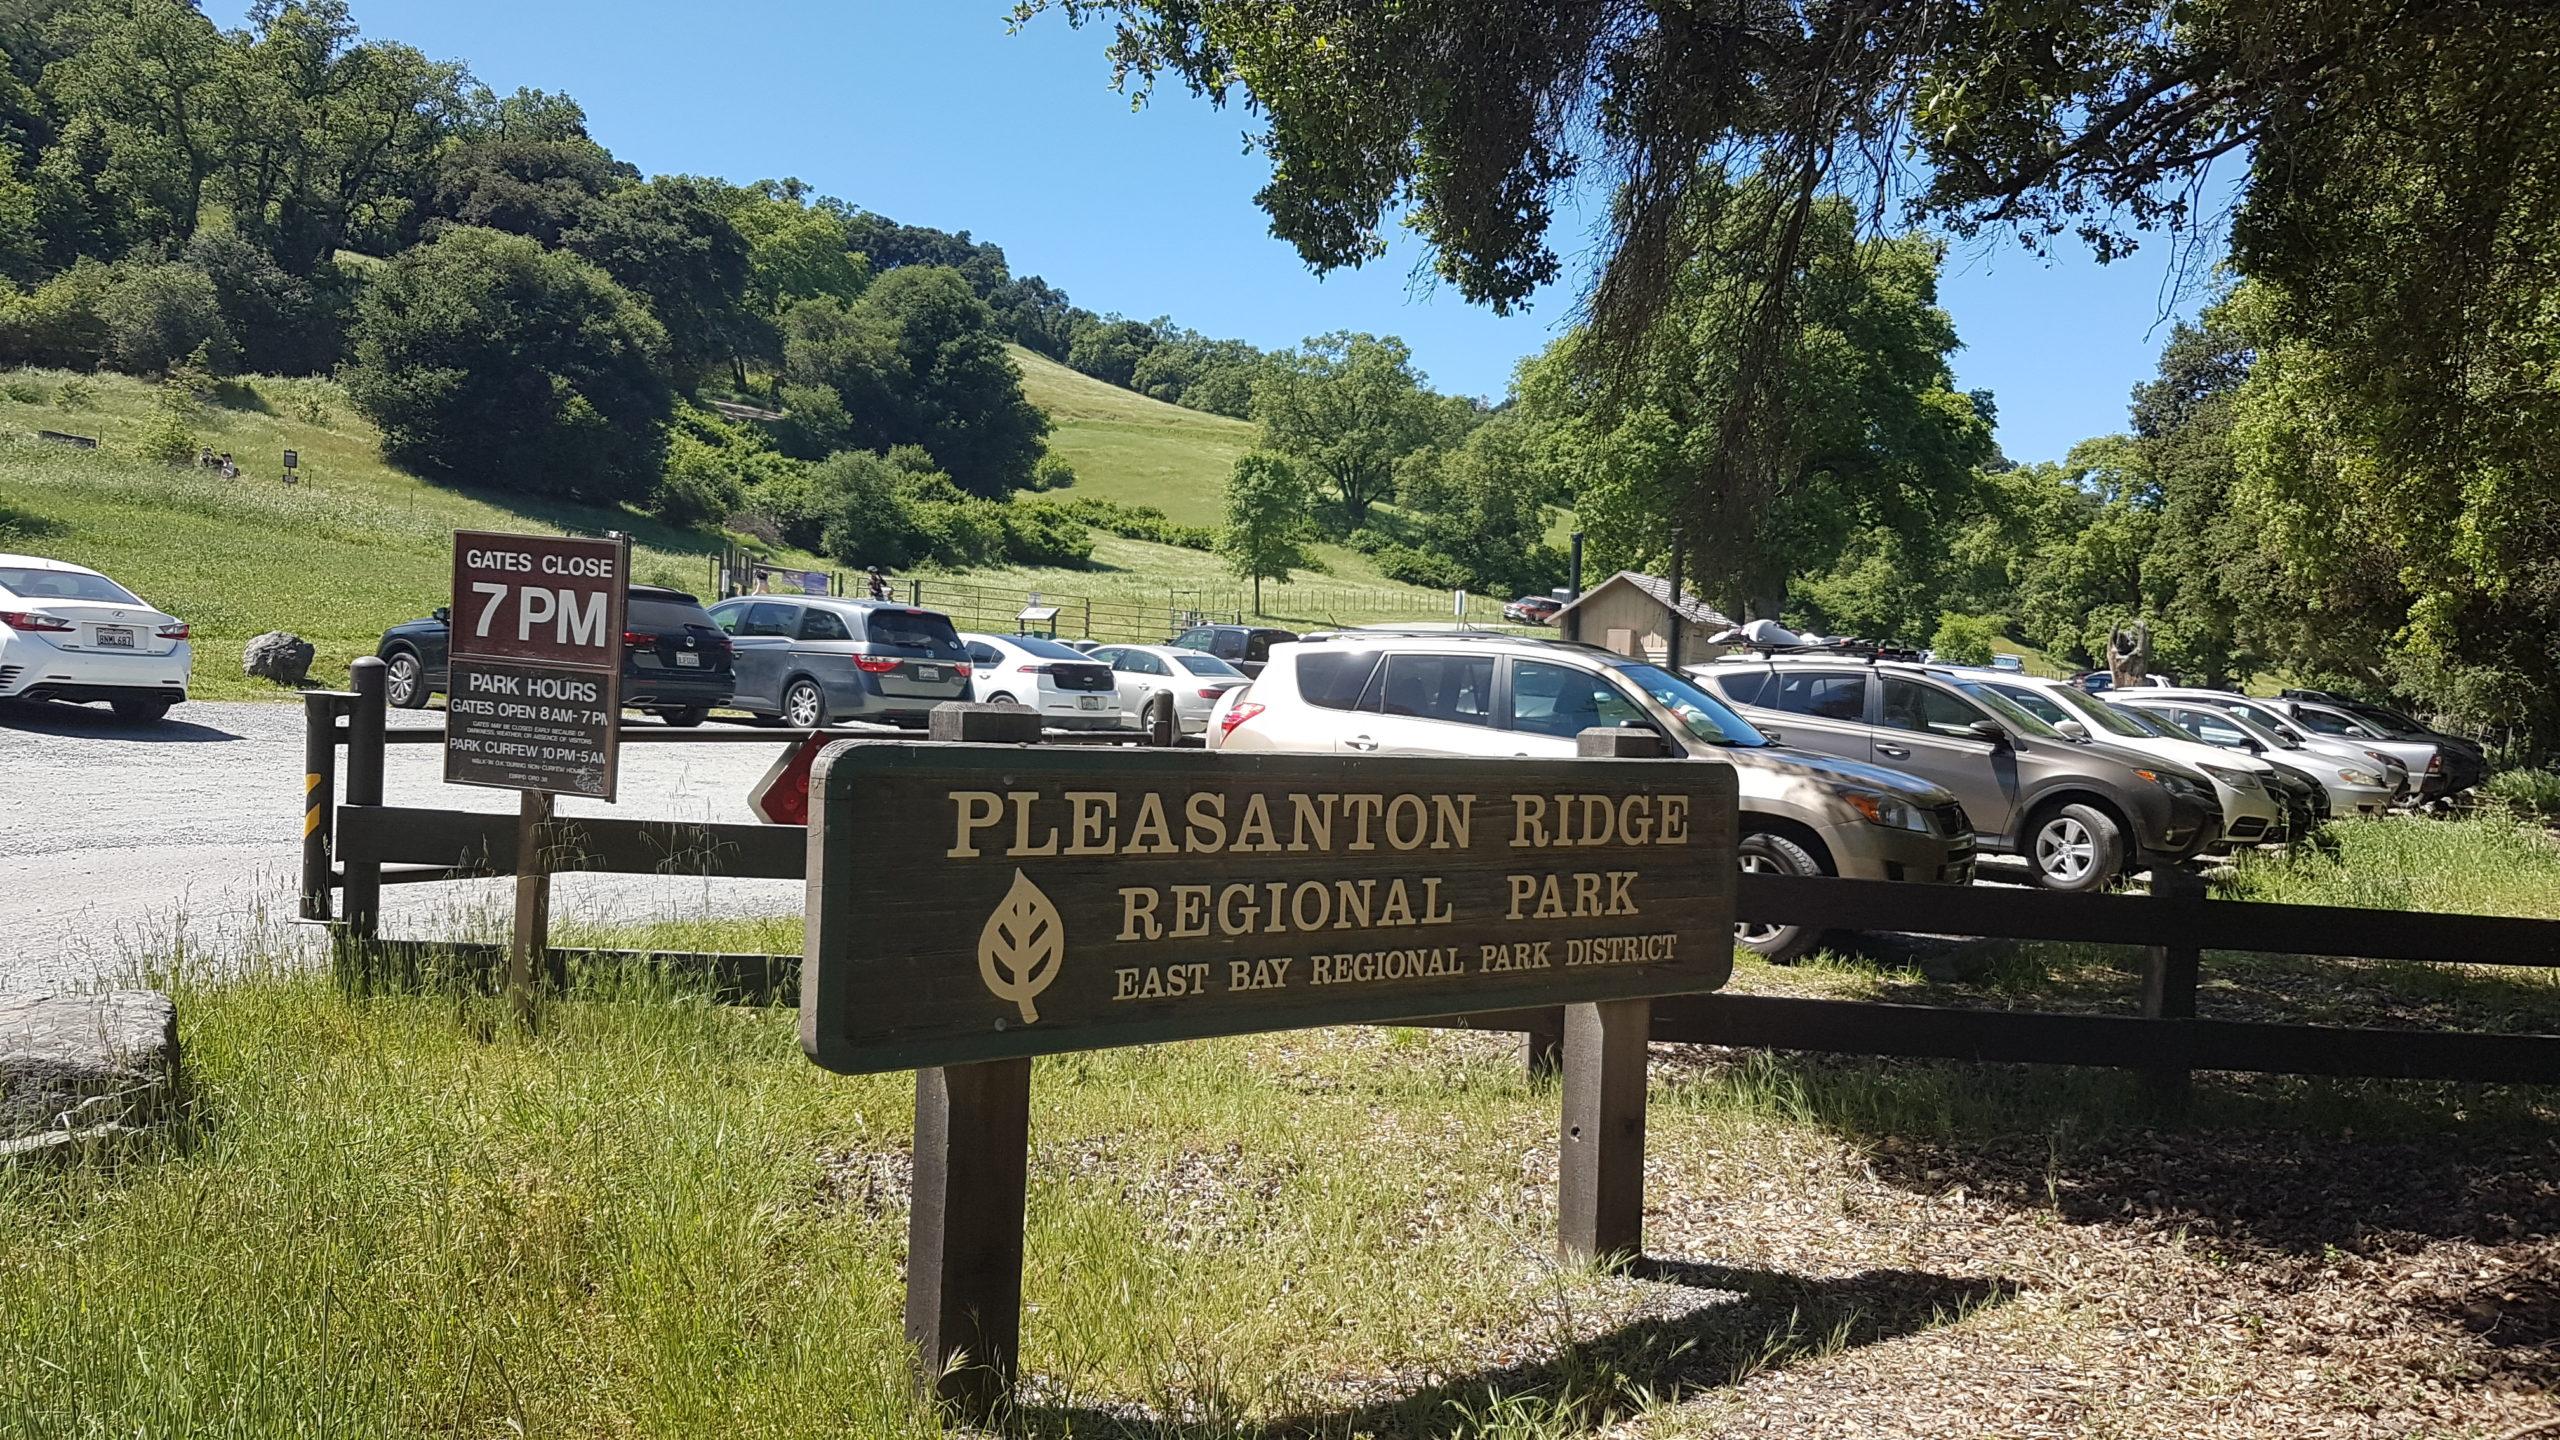 pleasanton ridge regional park 9